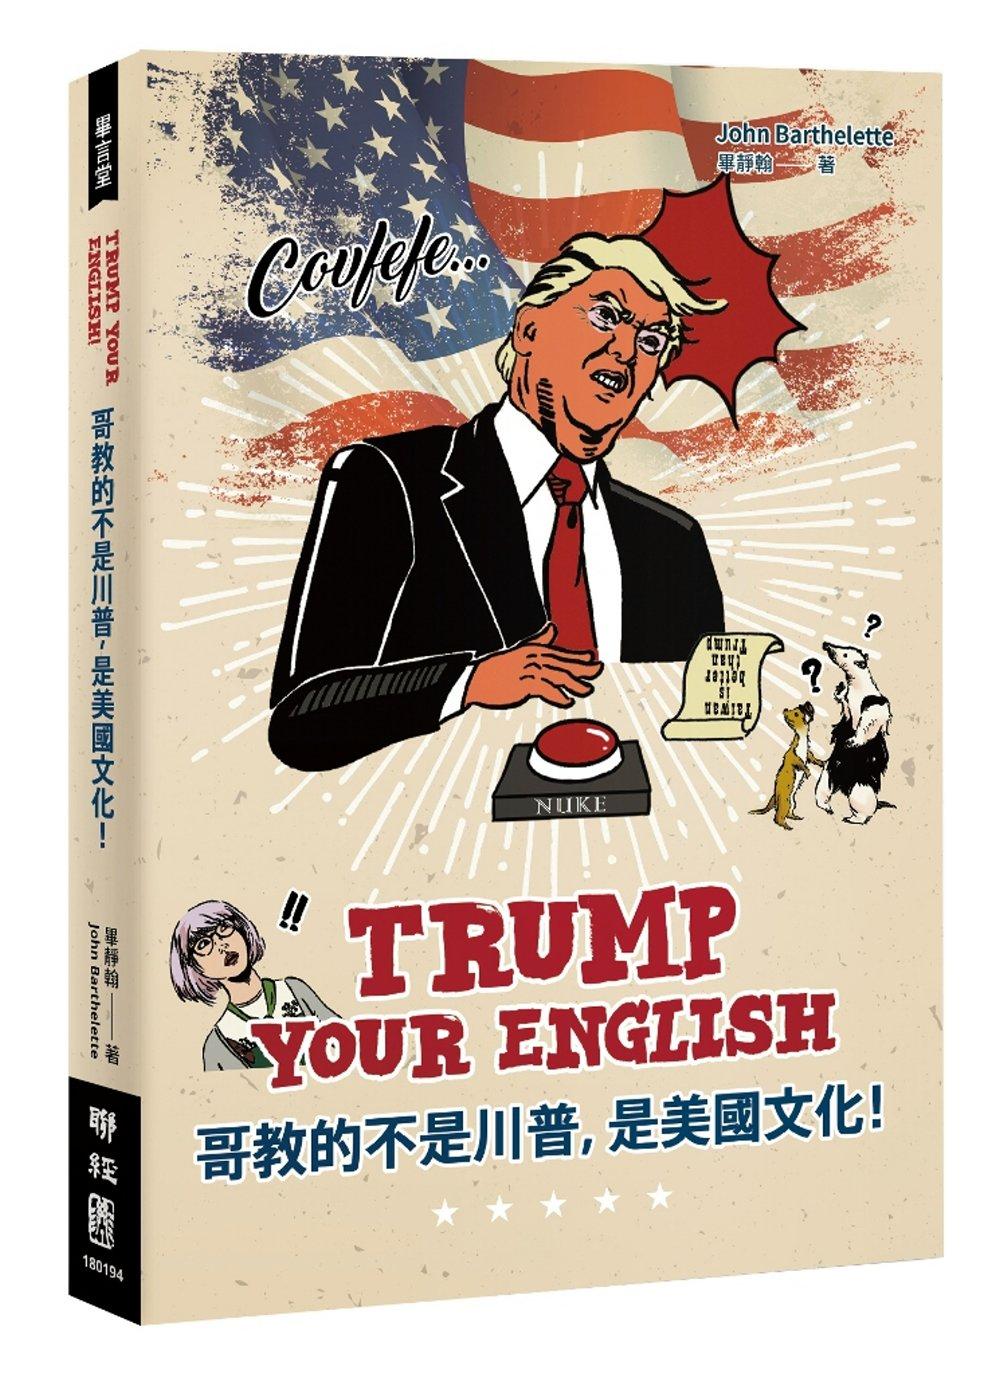 Trump Your English 哥教的不是川普,是美國文化!(限量作者簽名版)